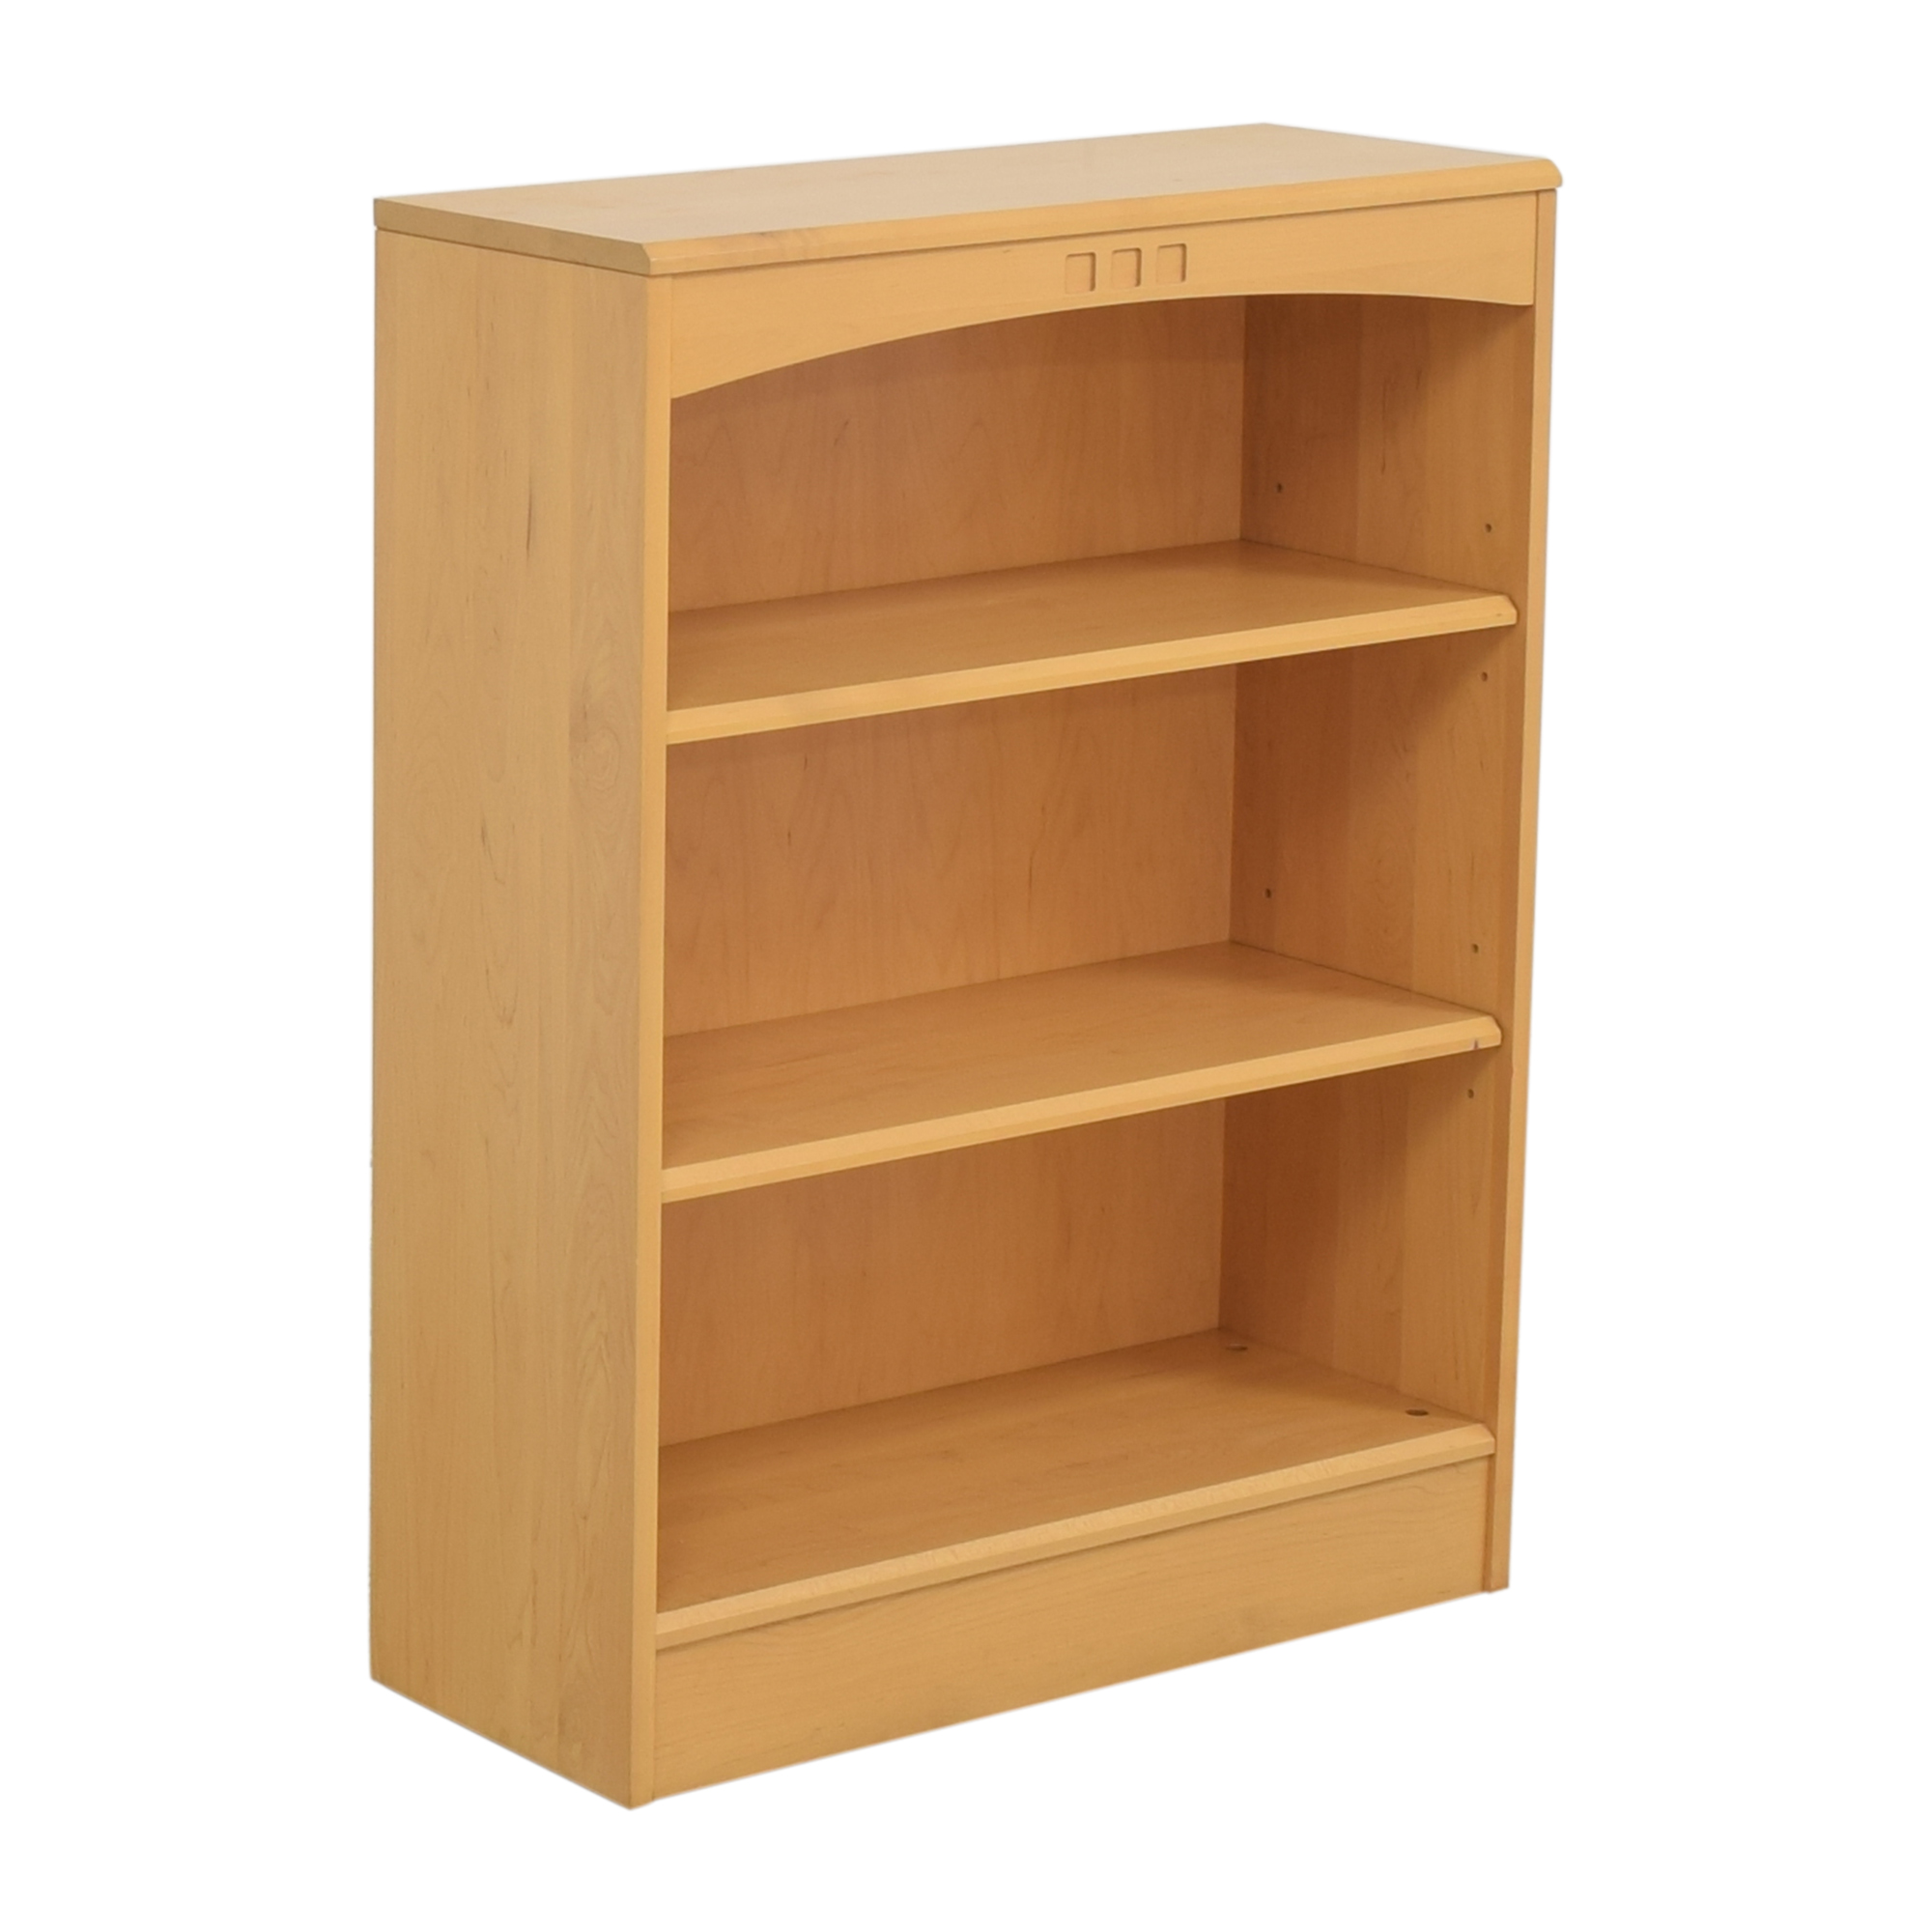 Ethan Allen Ethan Allen American Dimensions Bookshelf dimensions